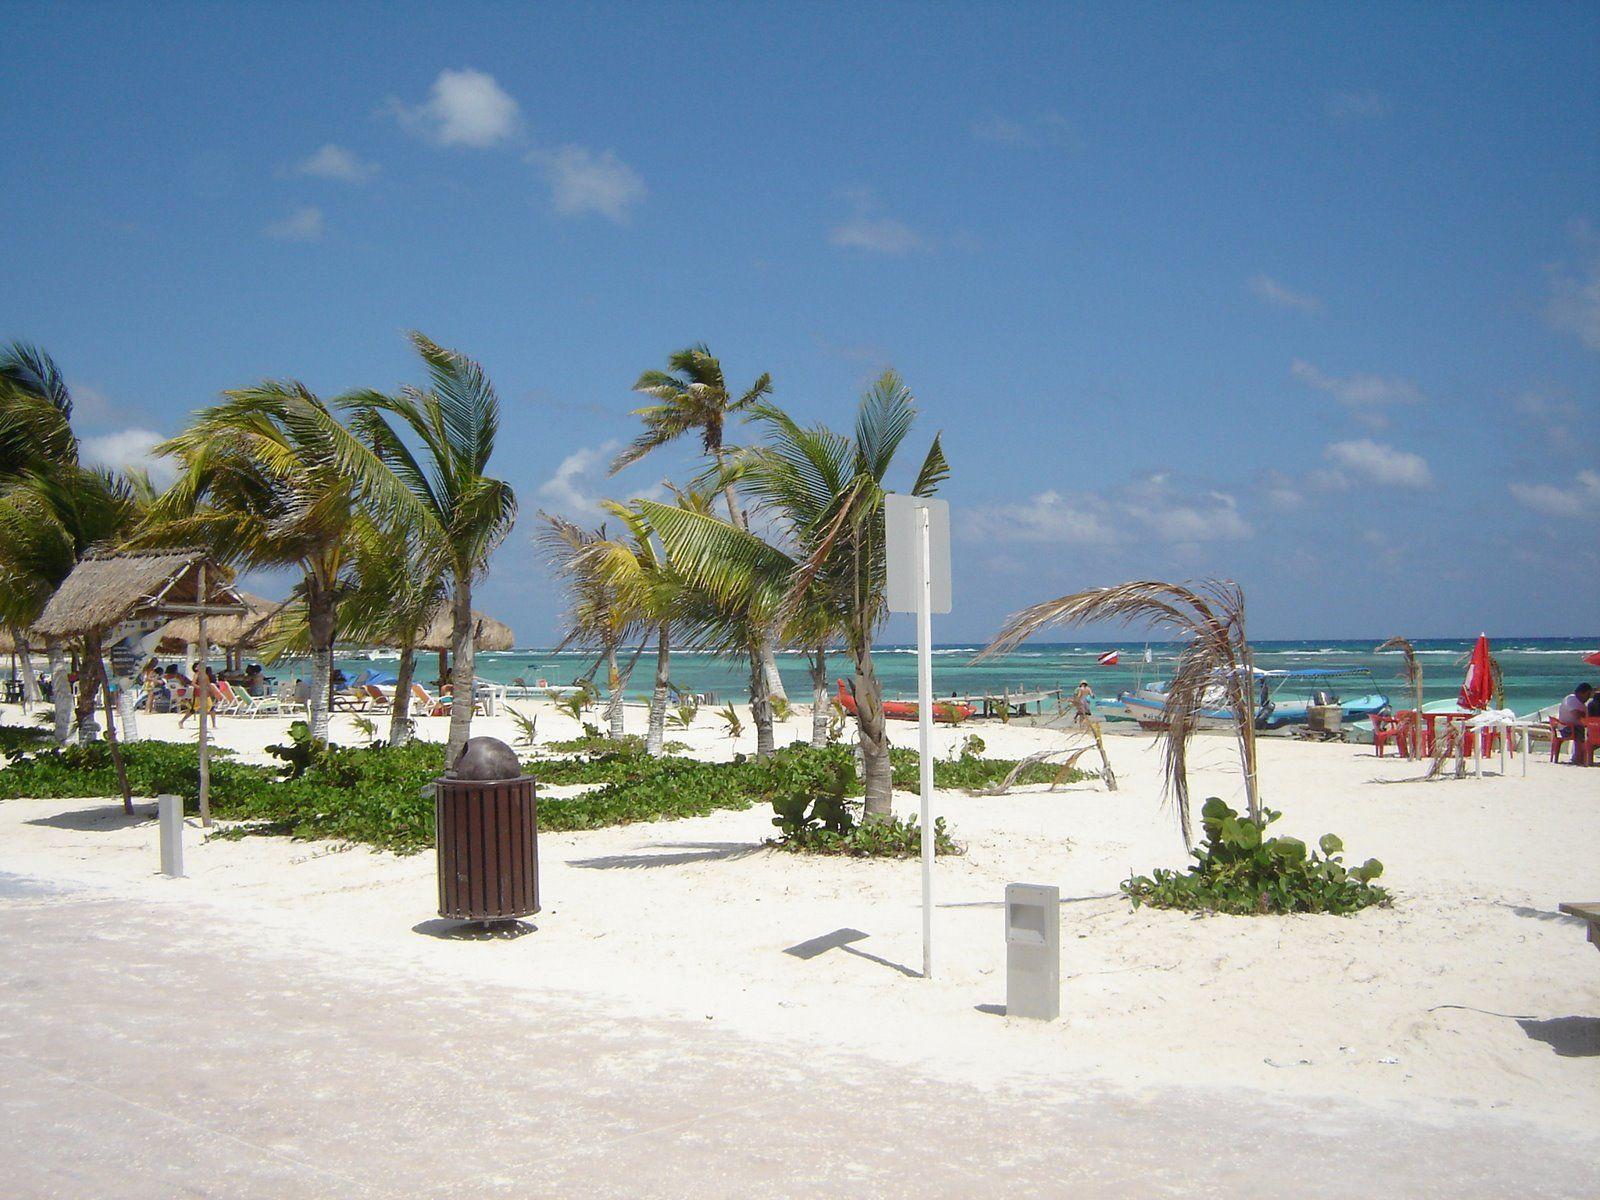 Mahahual, paraíso tropical